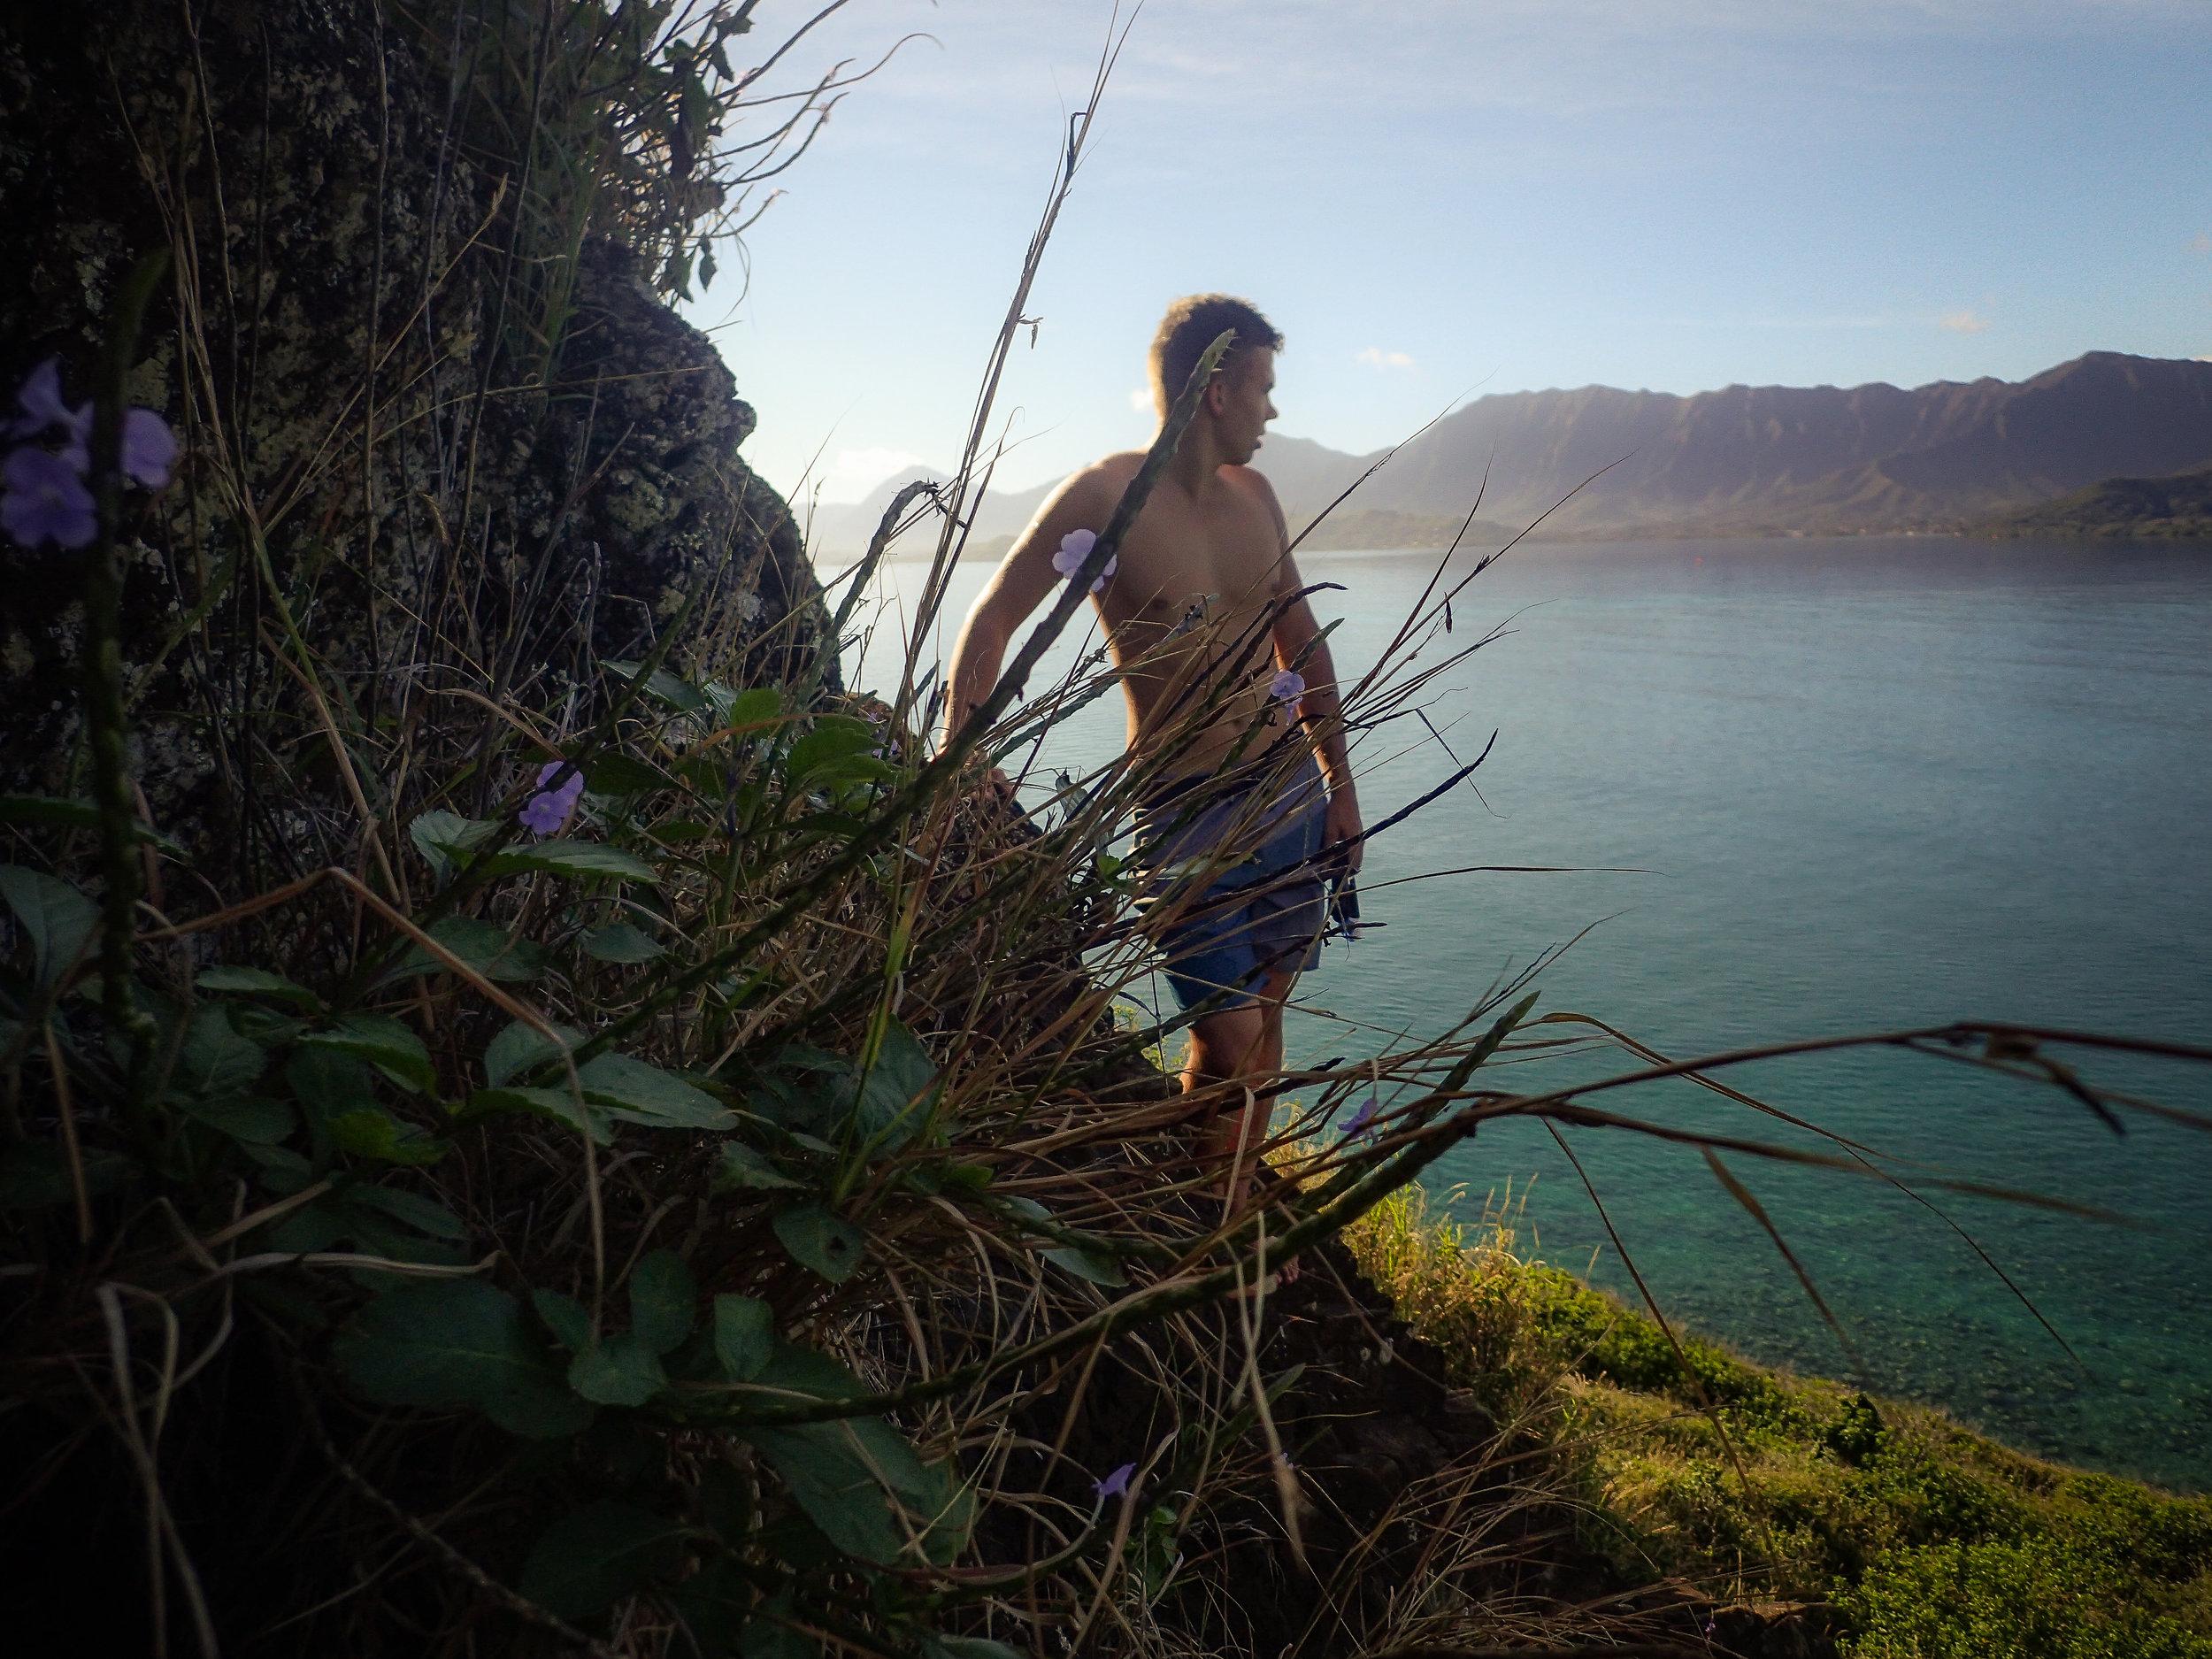 P_Tr_HI_Oahu_Olympus Images-218.jpg